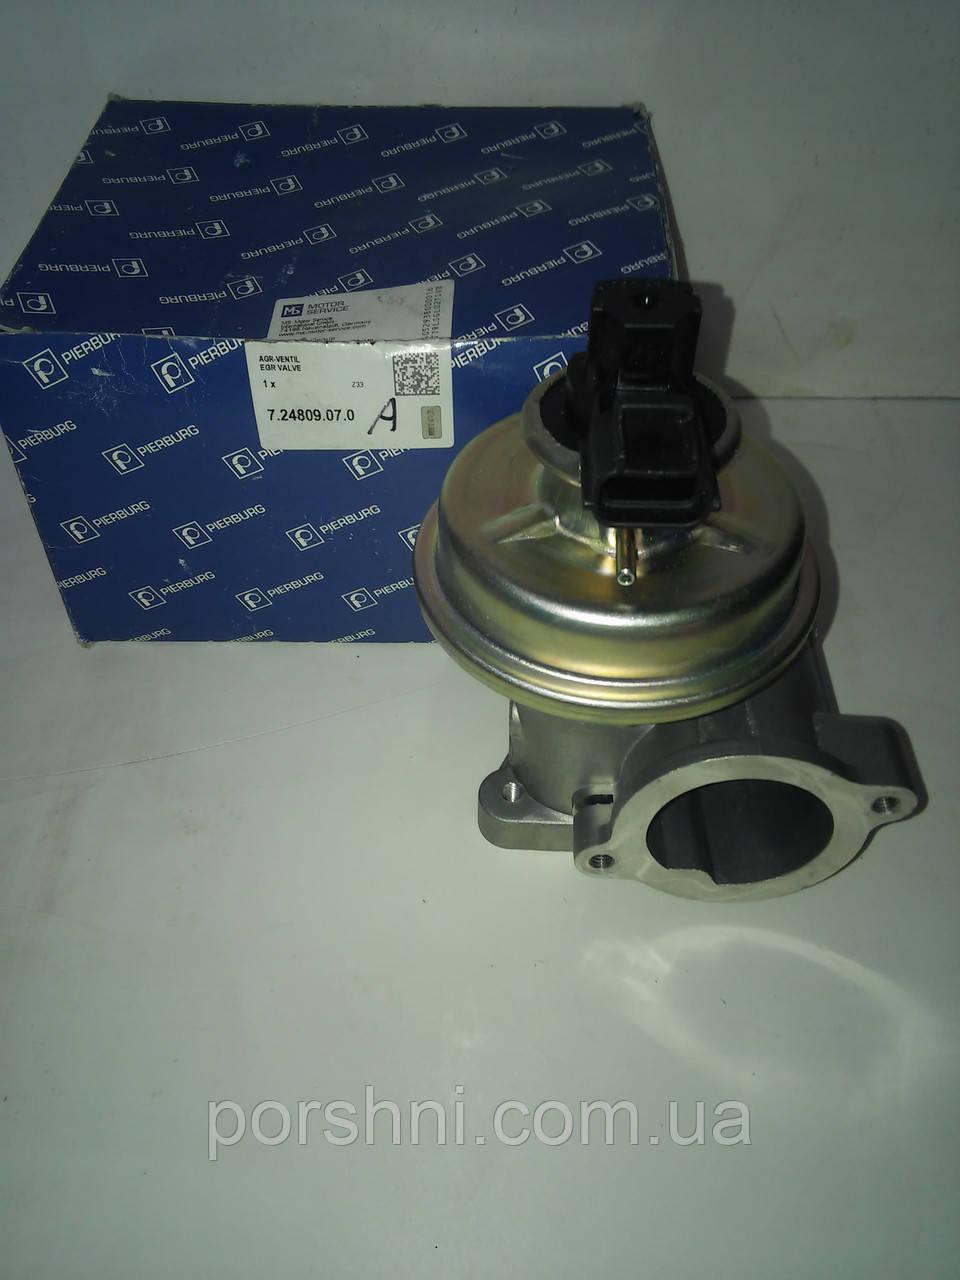 Клапан  EGR Ford Transit  2.0 - 2.4  2001 > PIEBURG  7.24809.07.0    N: 1220819